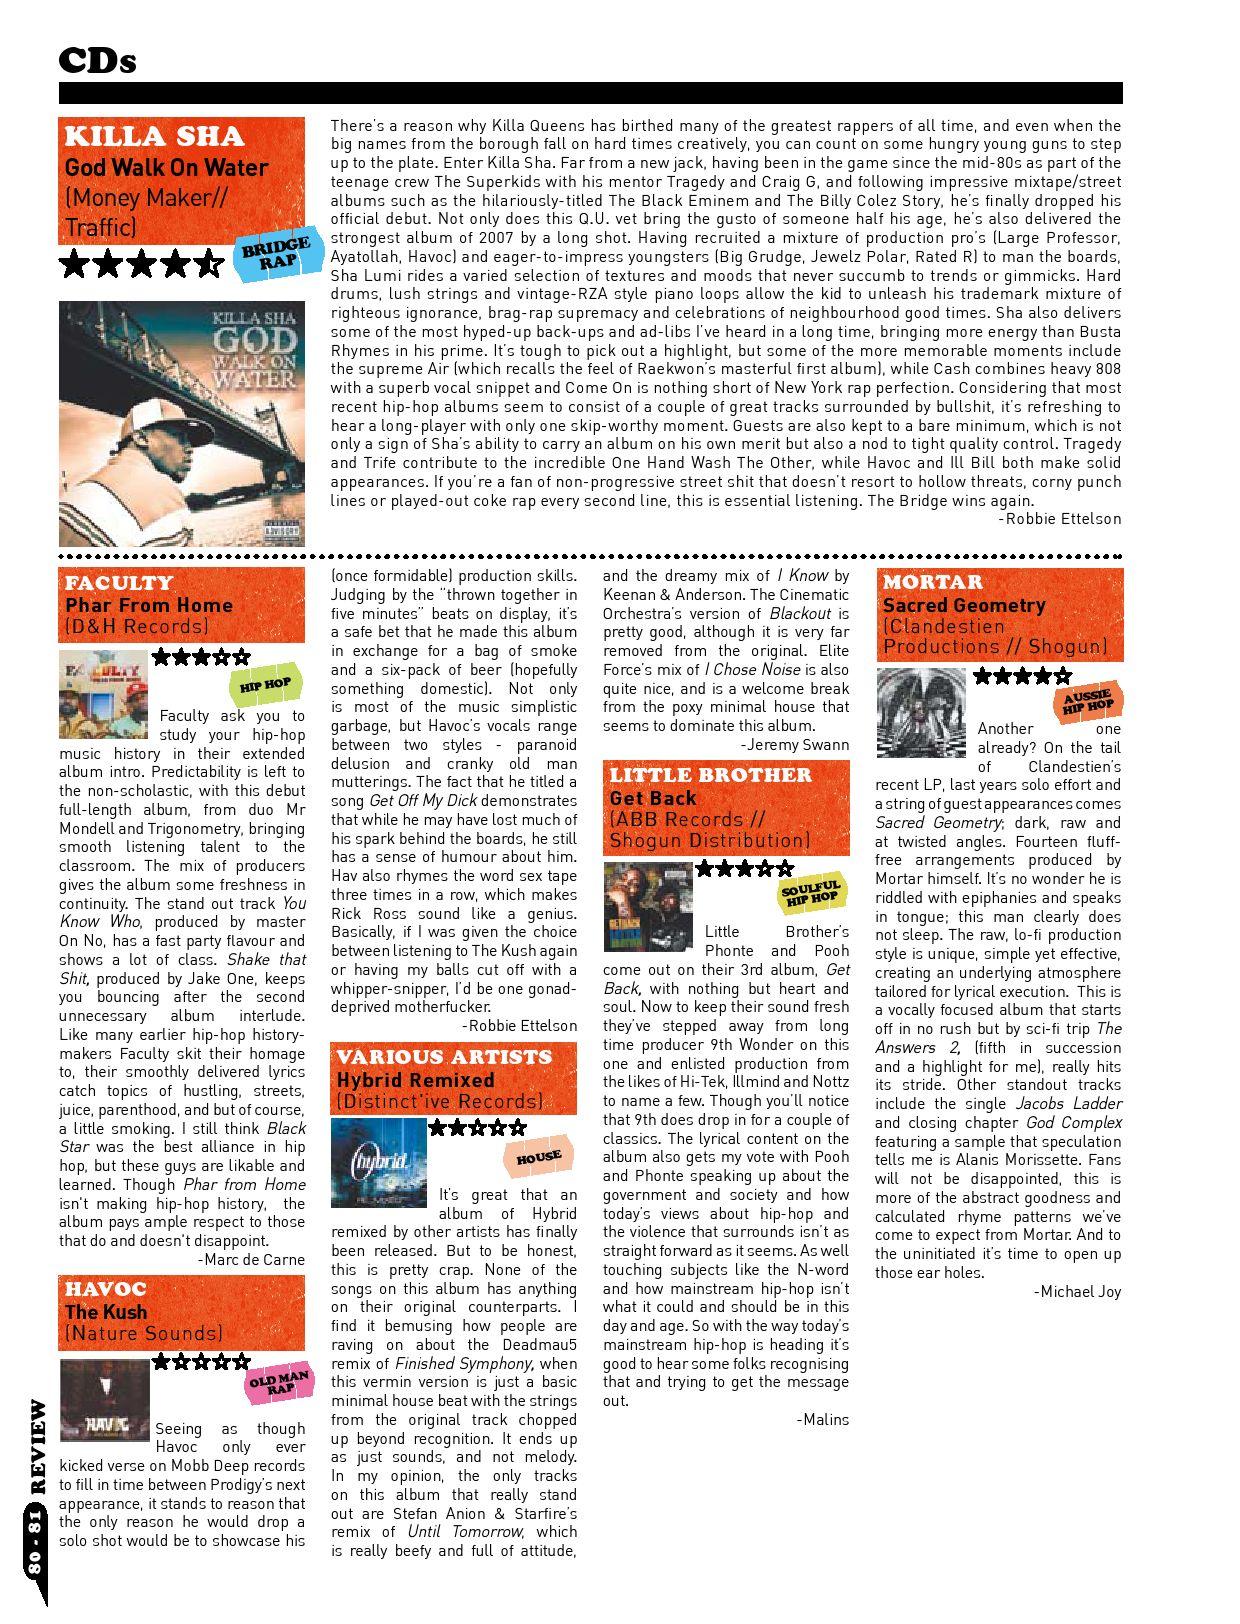 ACCLAIM Magazine Issue 11 by ACCLAIM Magazine Pty Ltd - issuu